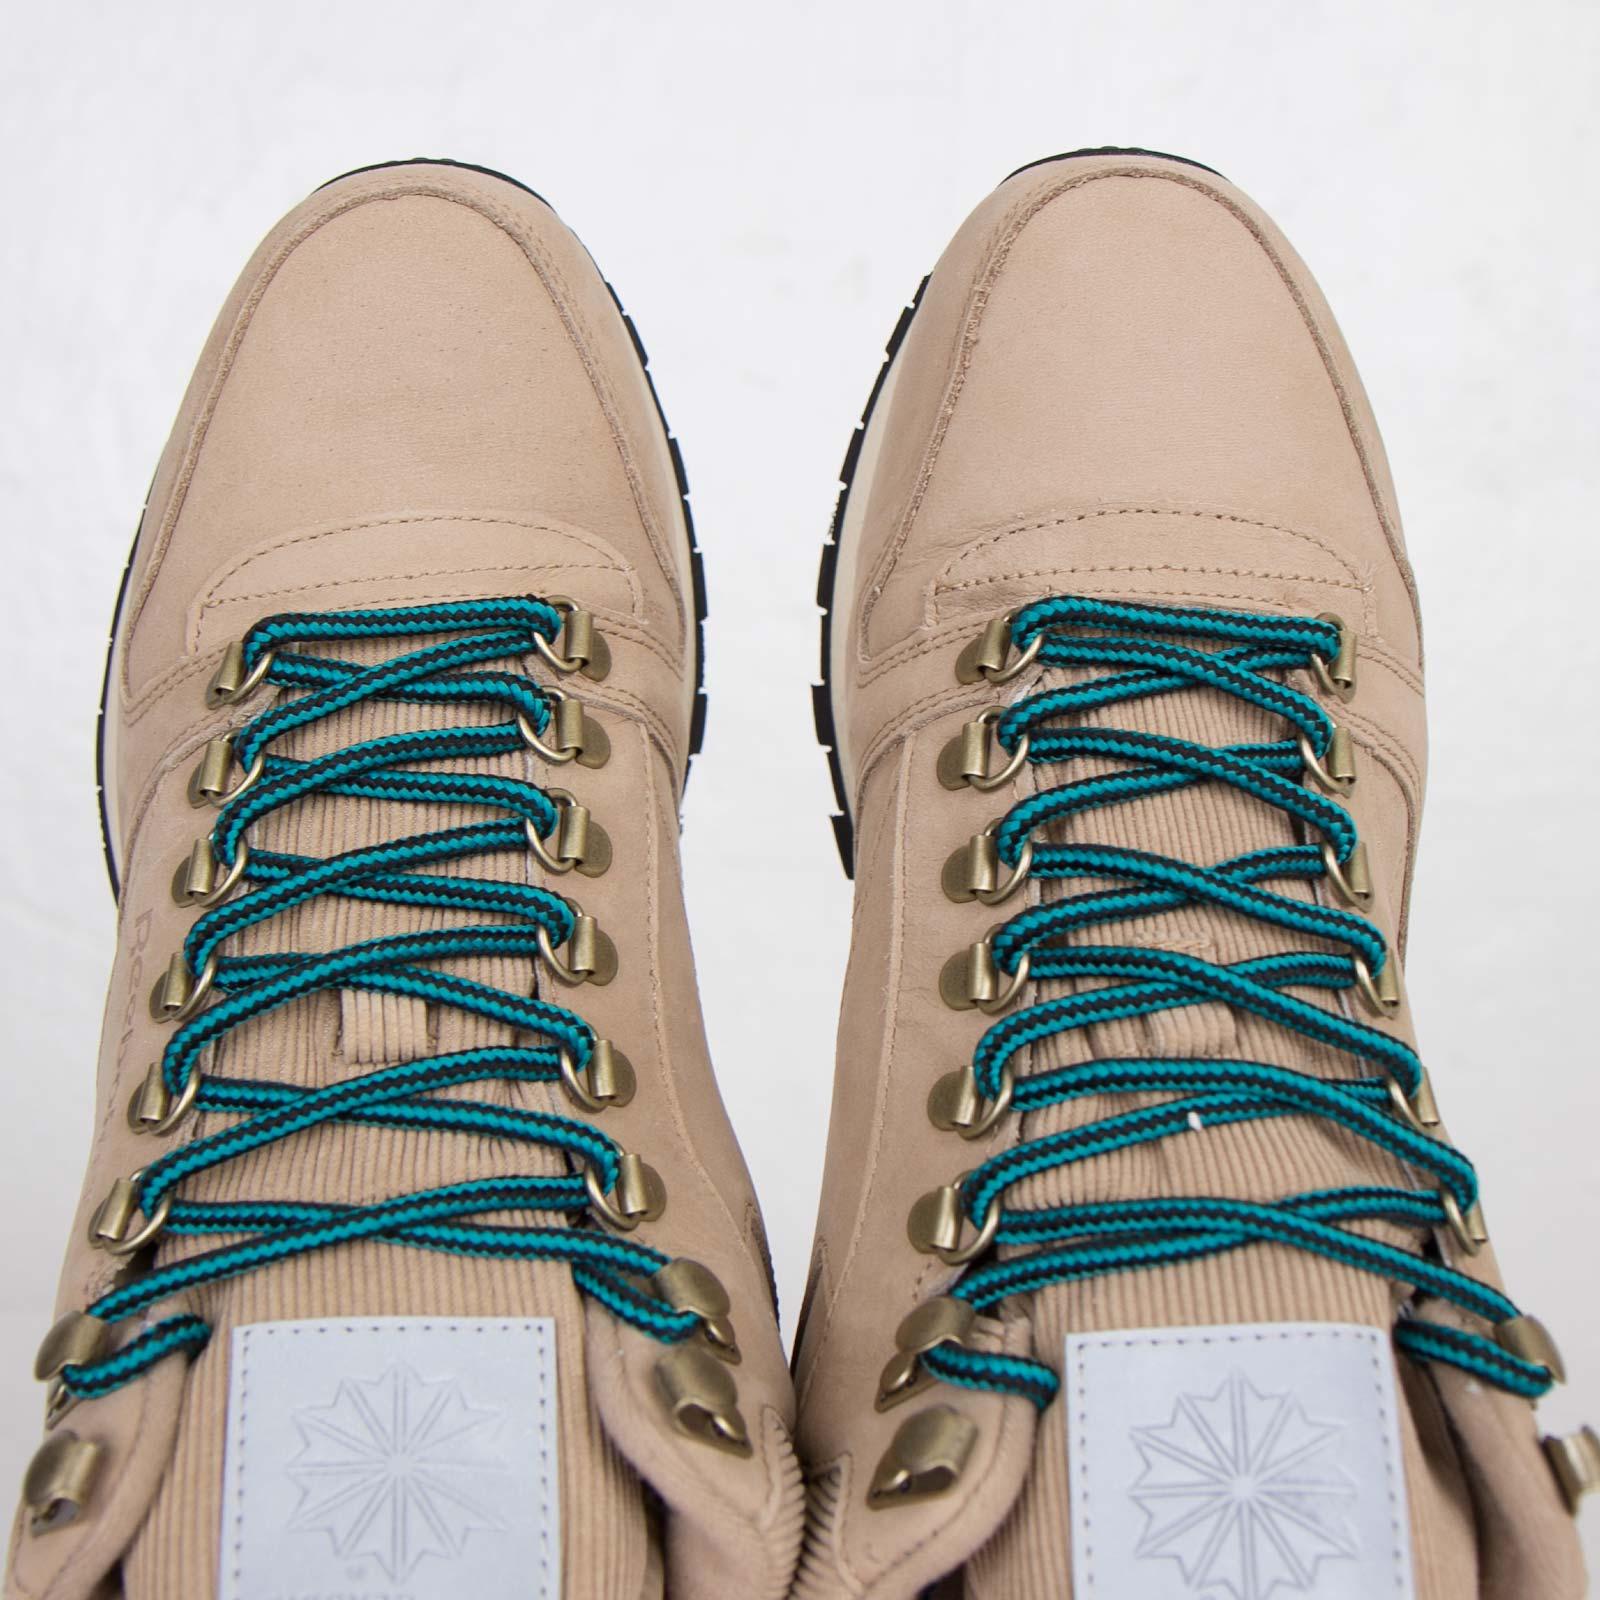 sencillo fluir Alérgico  Reebok Classic Leather Mid Gore-Tex - V48355 - Sneakersnstuff | sneakers &  streetwear online since 1999